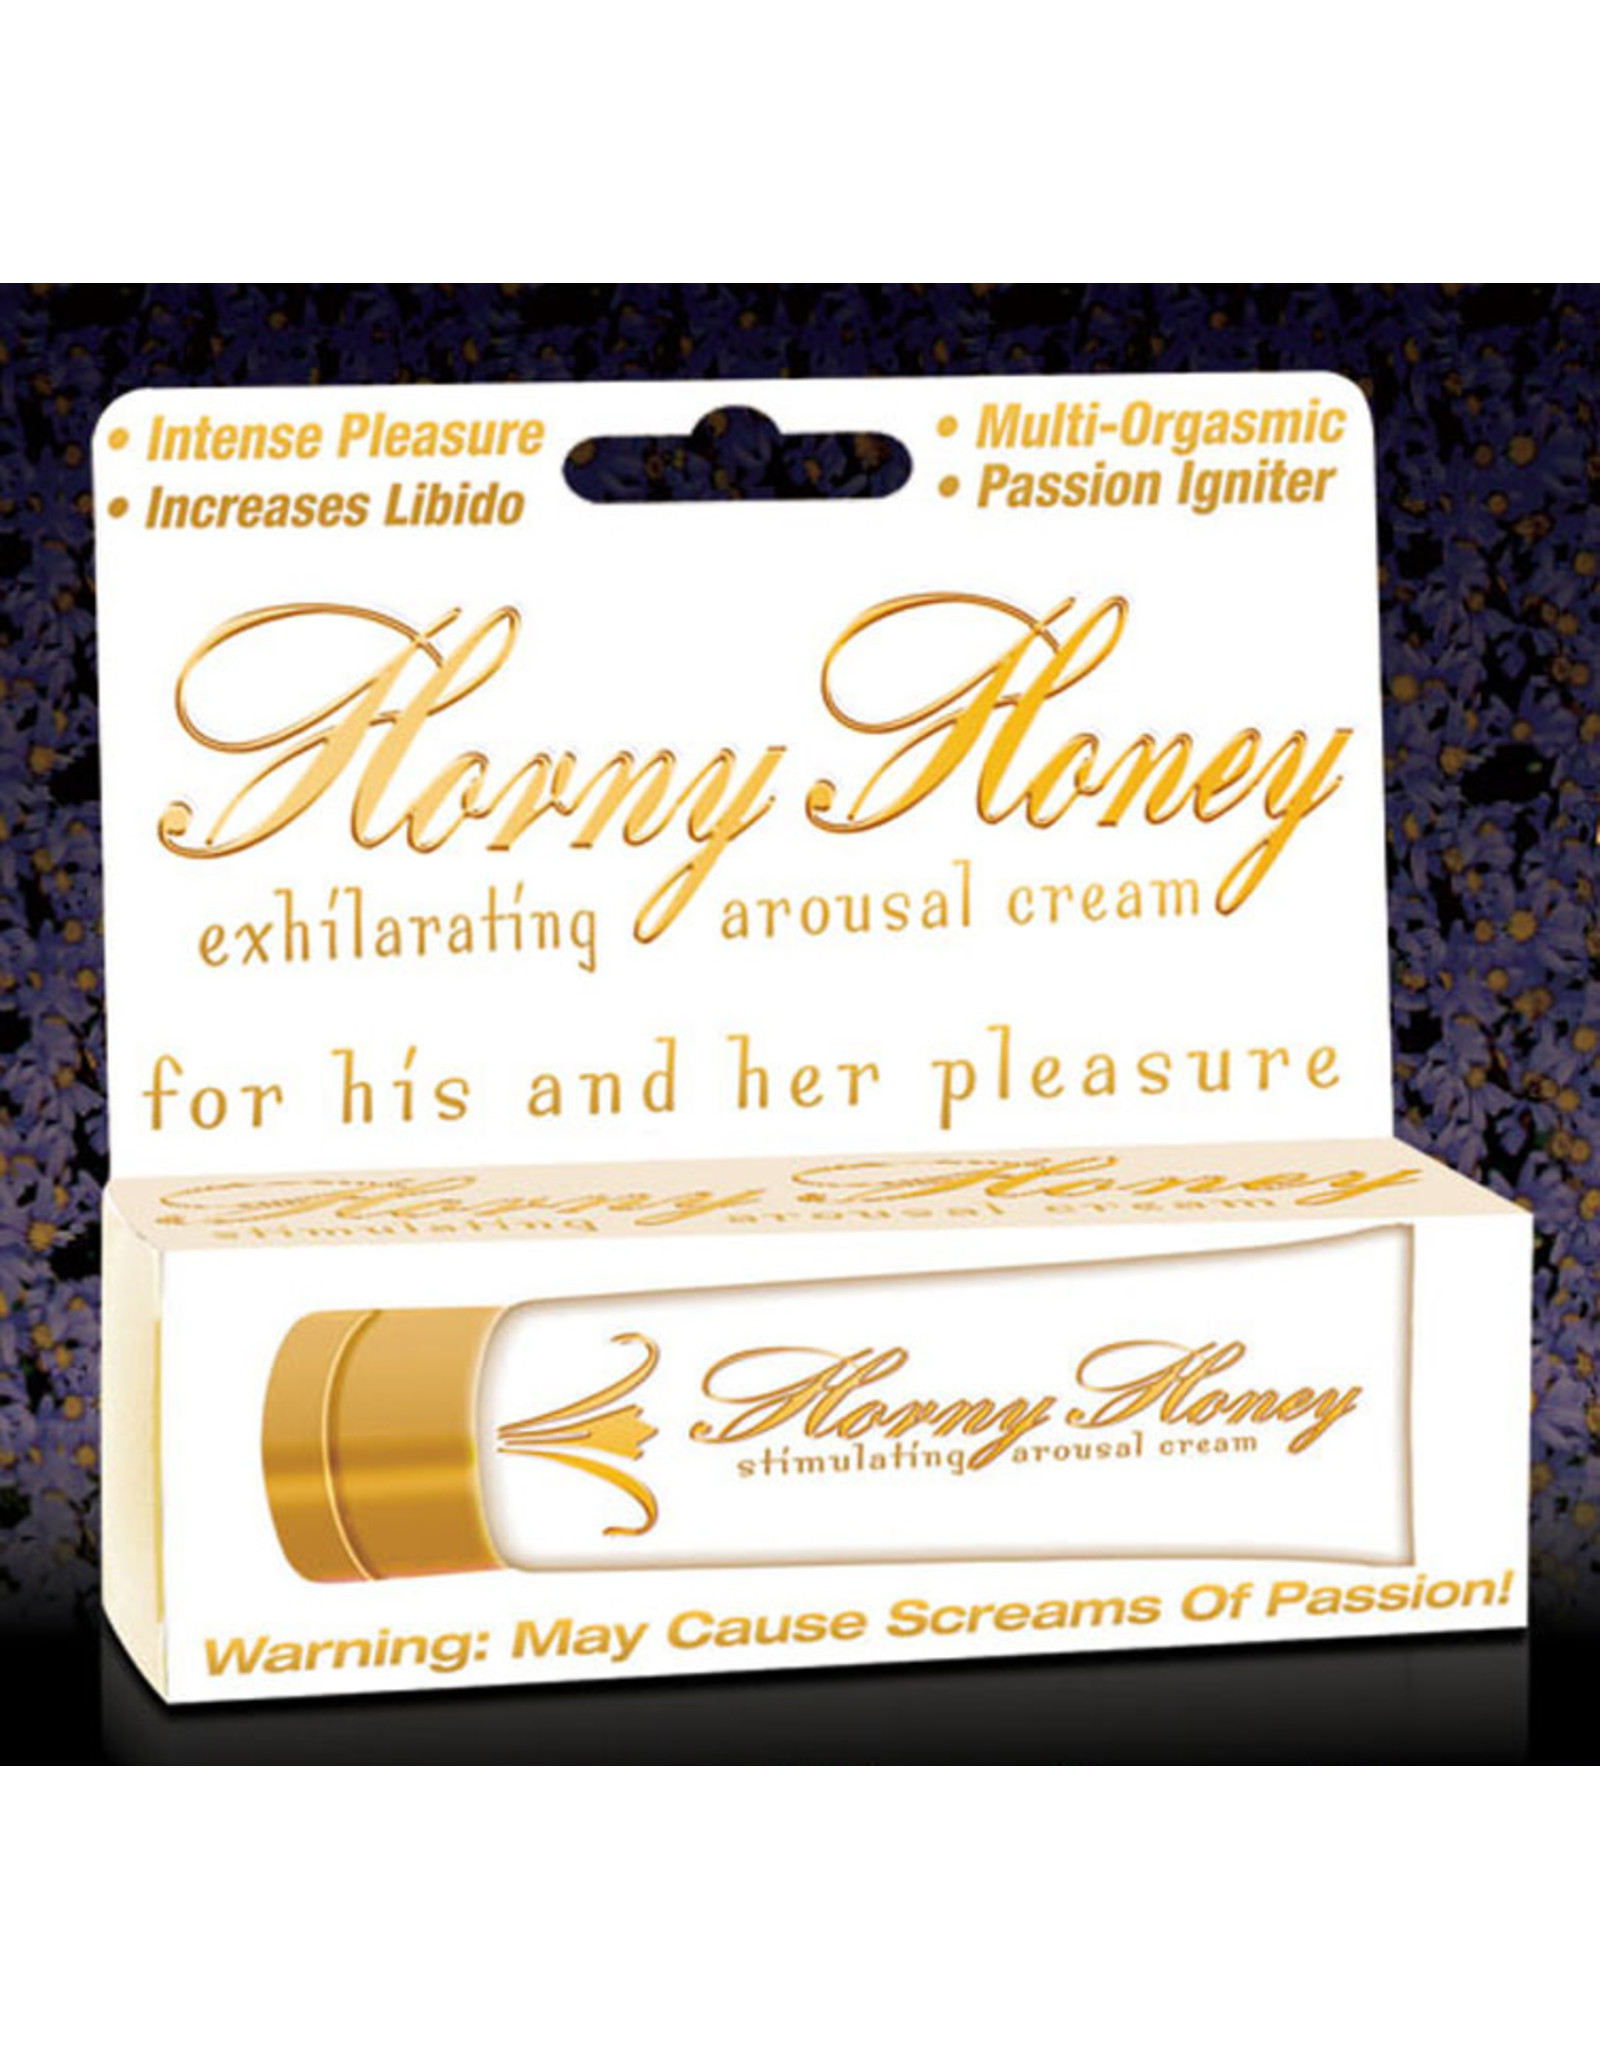 Hott Products Horny Honey - Exhilarating Arousal Cream 1oz